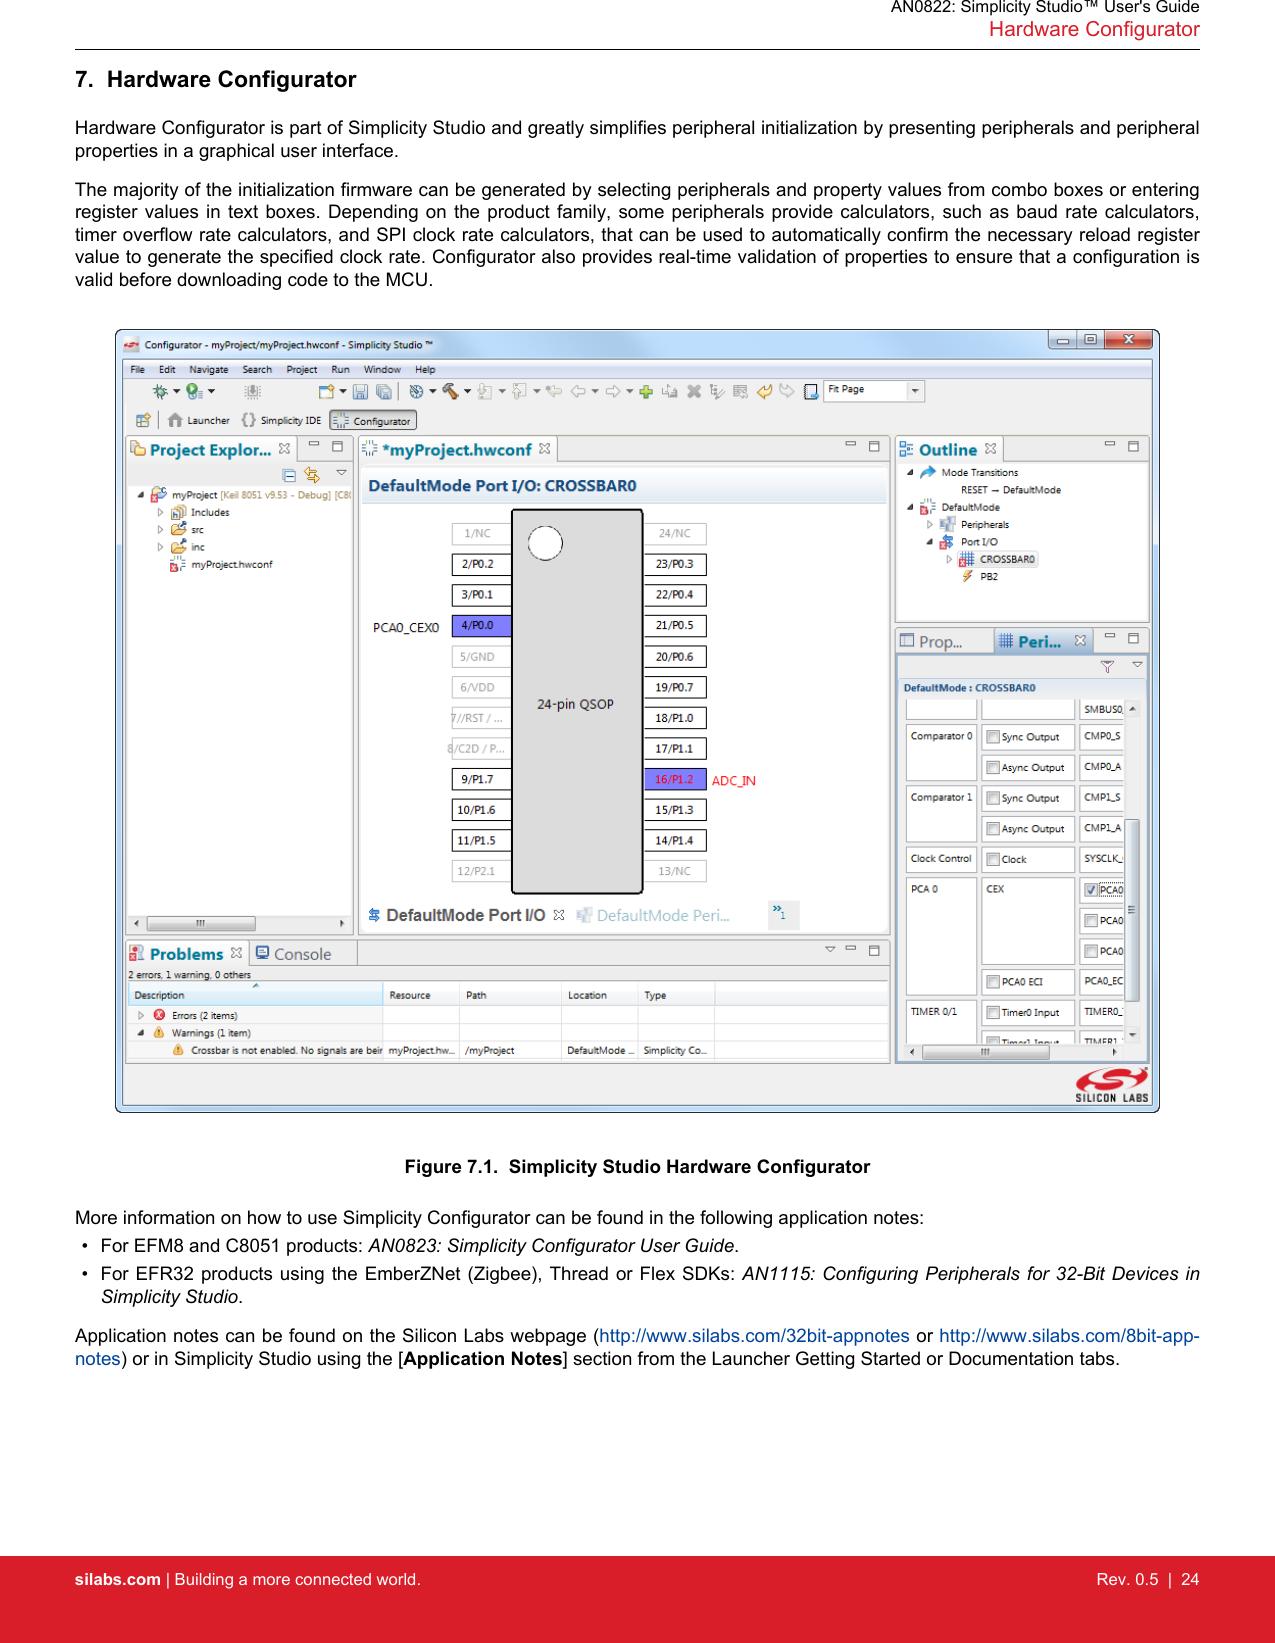 AN0822 simplicity studio user guide